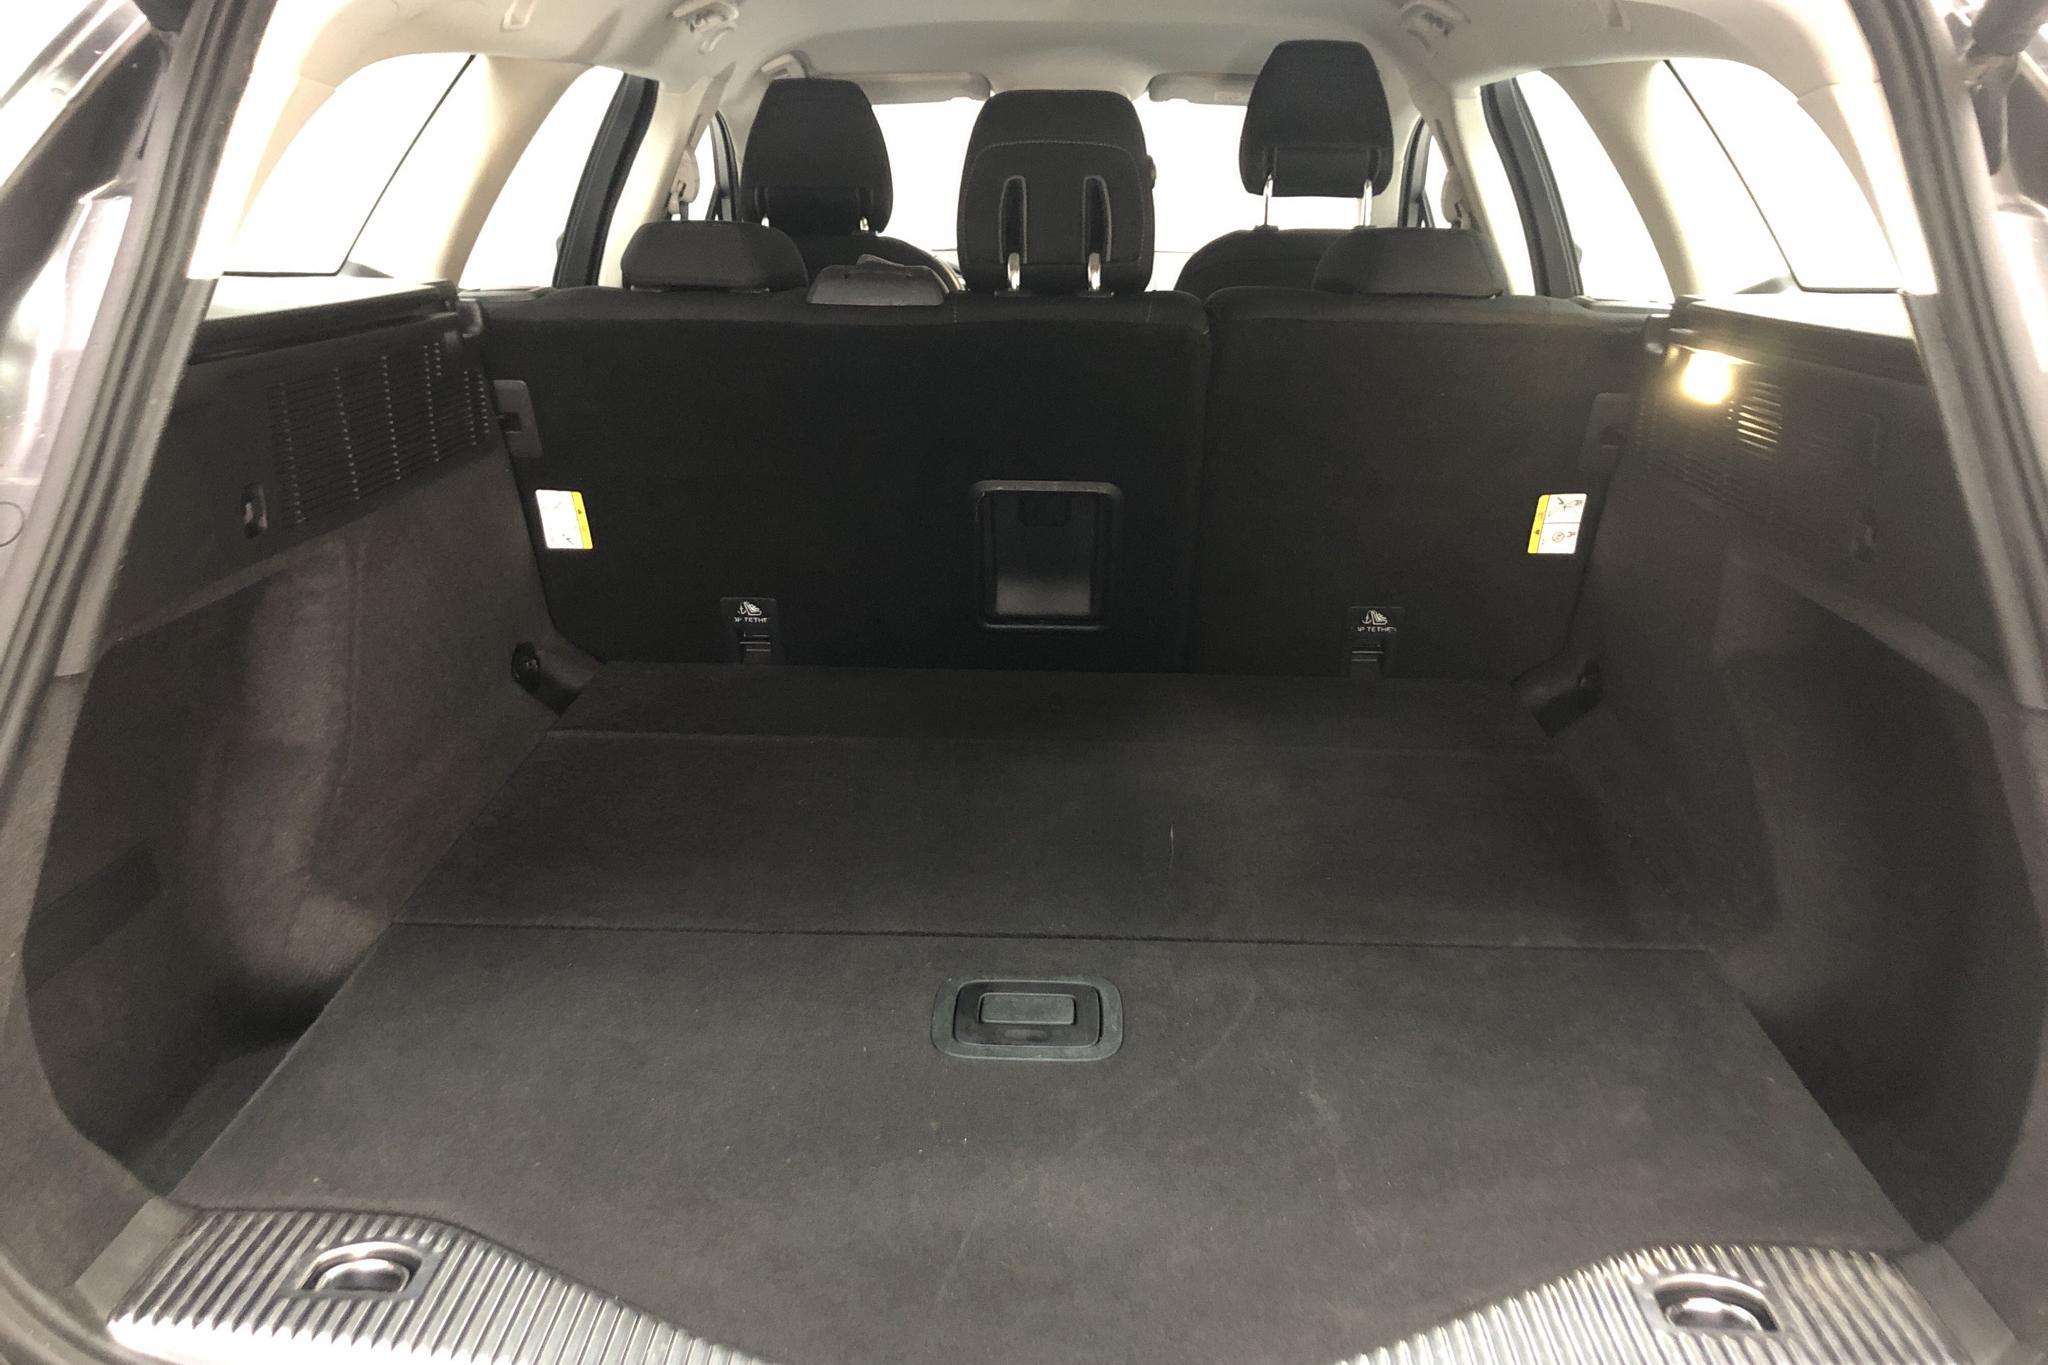 Ford Mondeo 2.0 TDCi Kombi (150hk) - 136 650 km - Automatic - gray - 2015